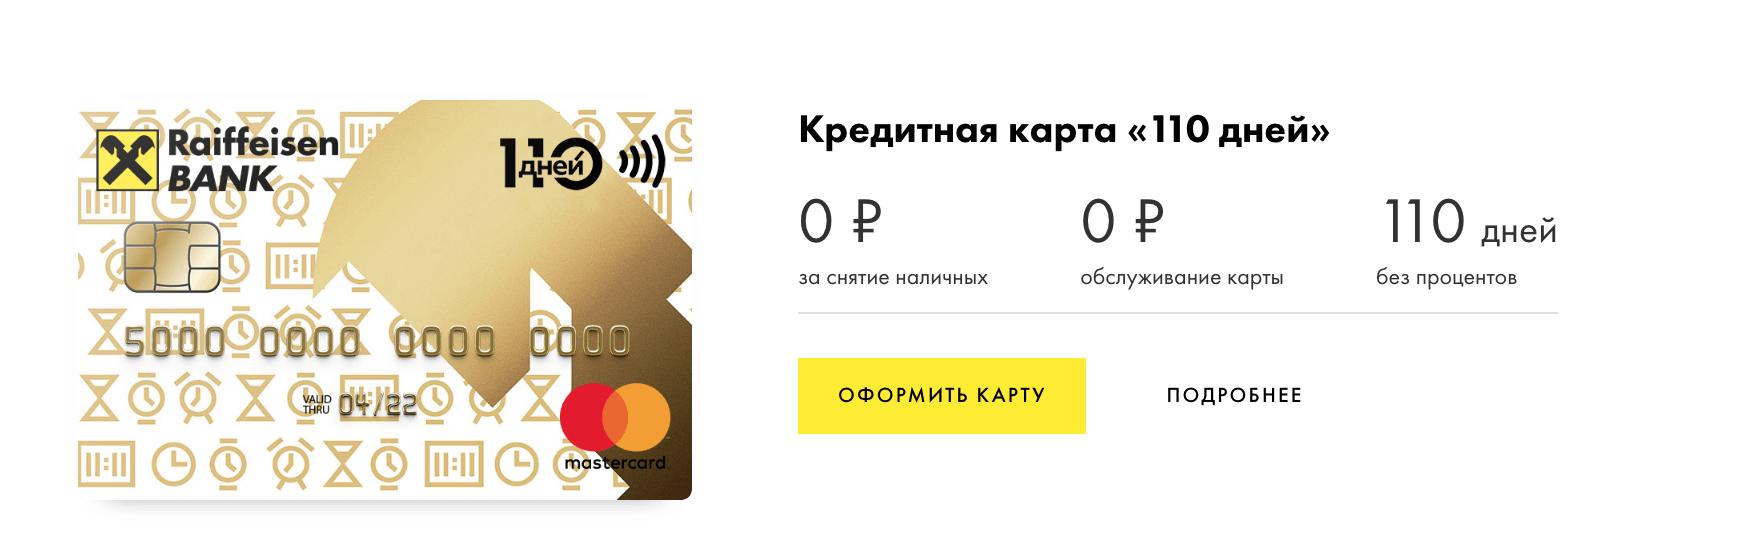 Взять кредит сбербанк онлайн заявка на кредит наличными